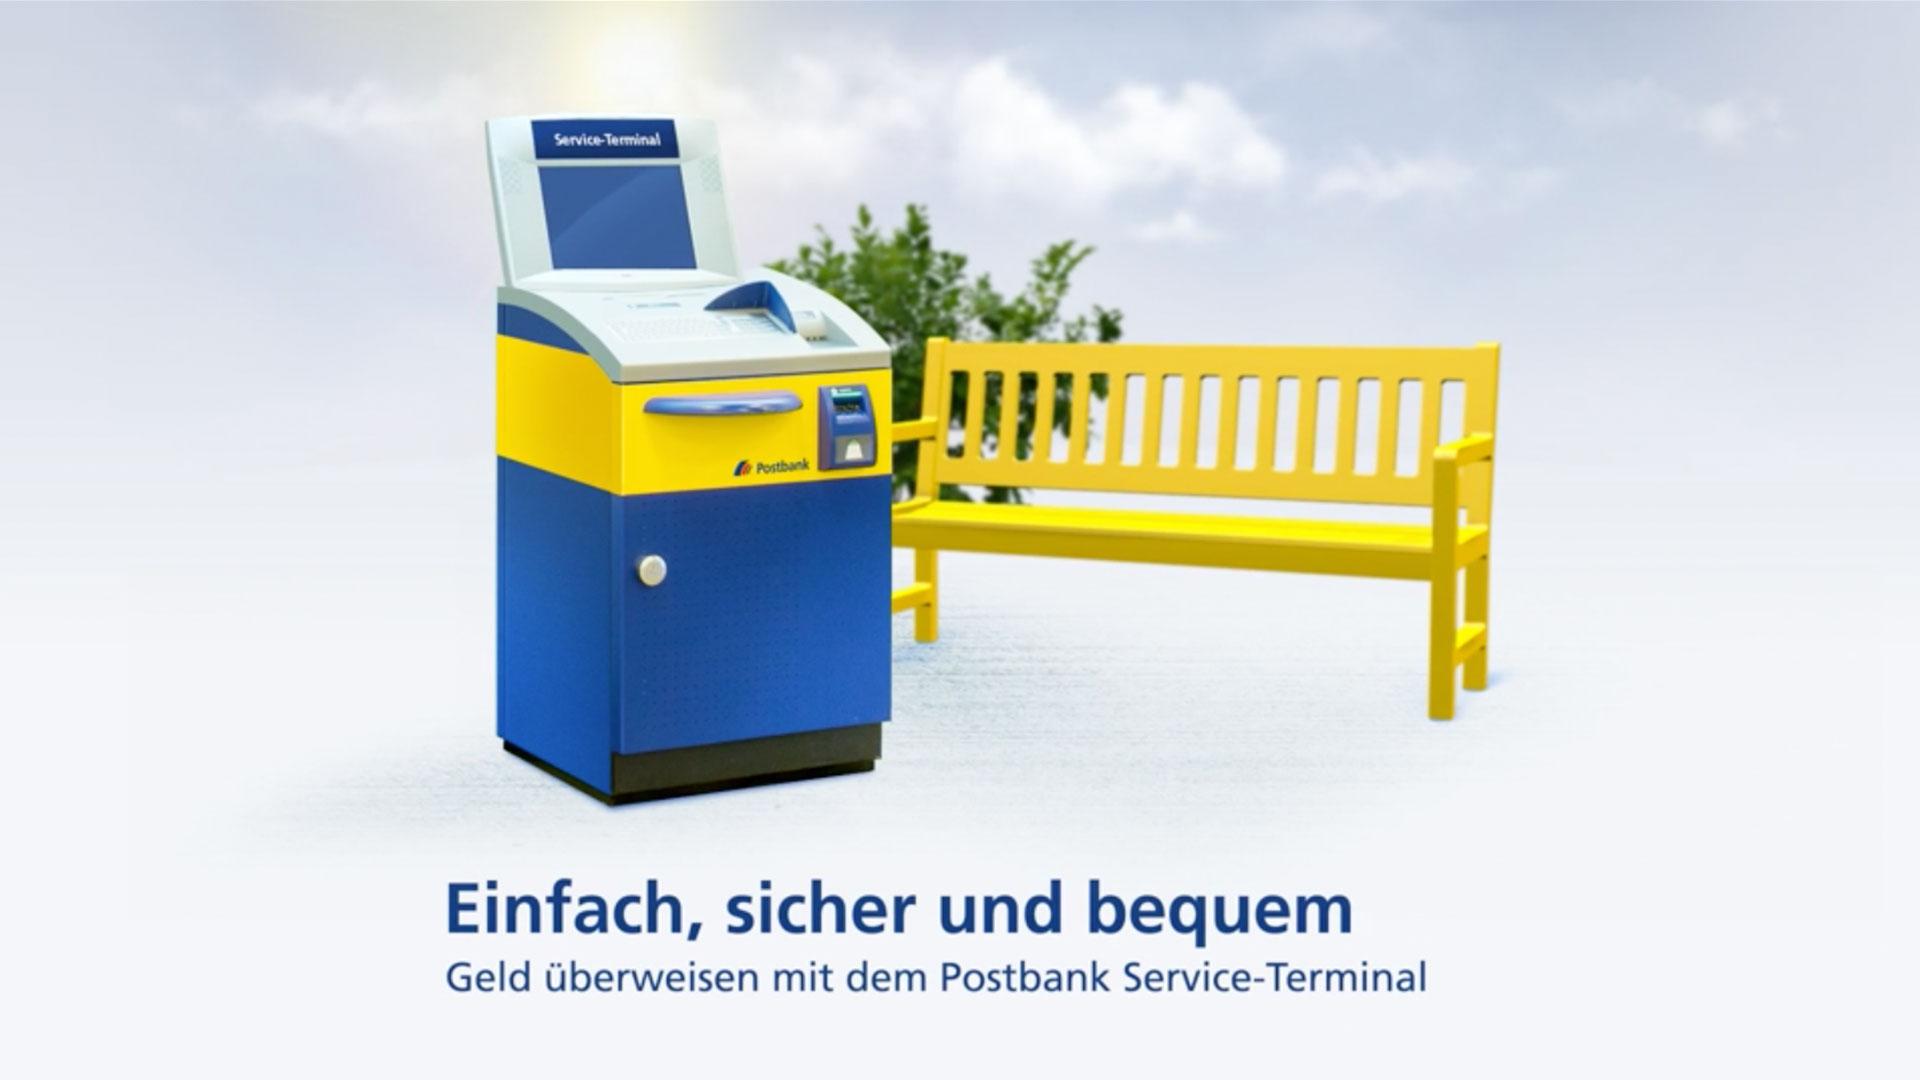 postbank-themenwelten-service-terminal-video-1920x1080.jpg